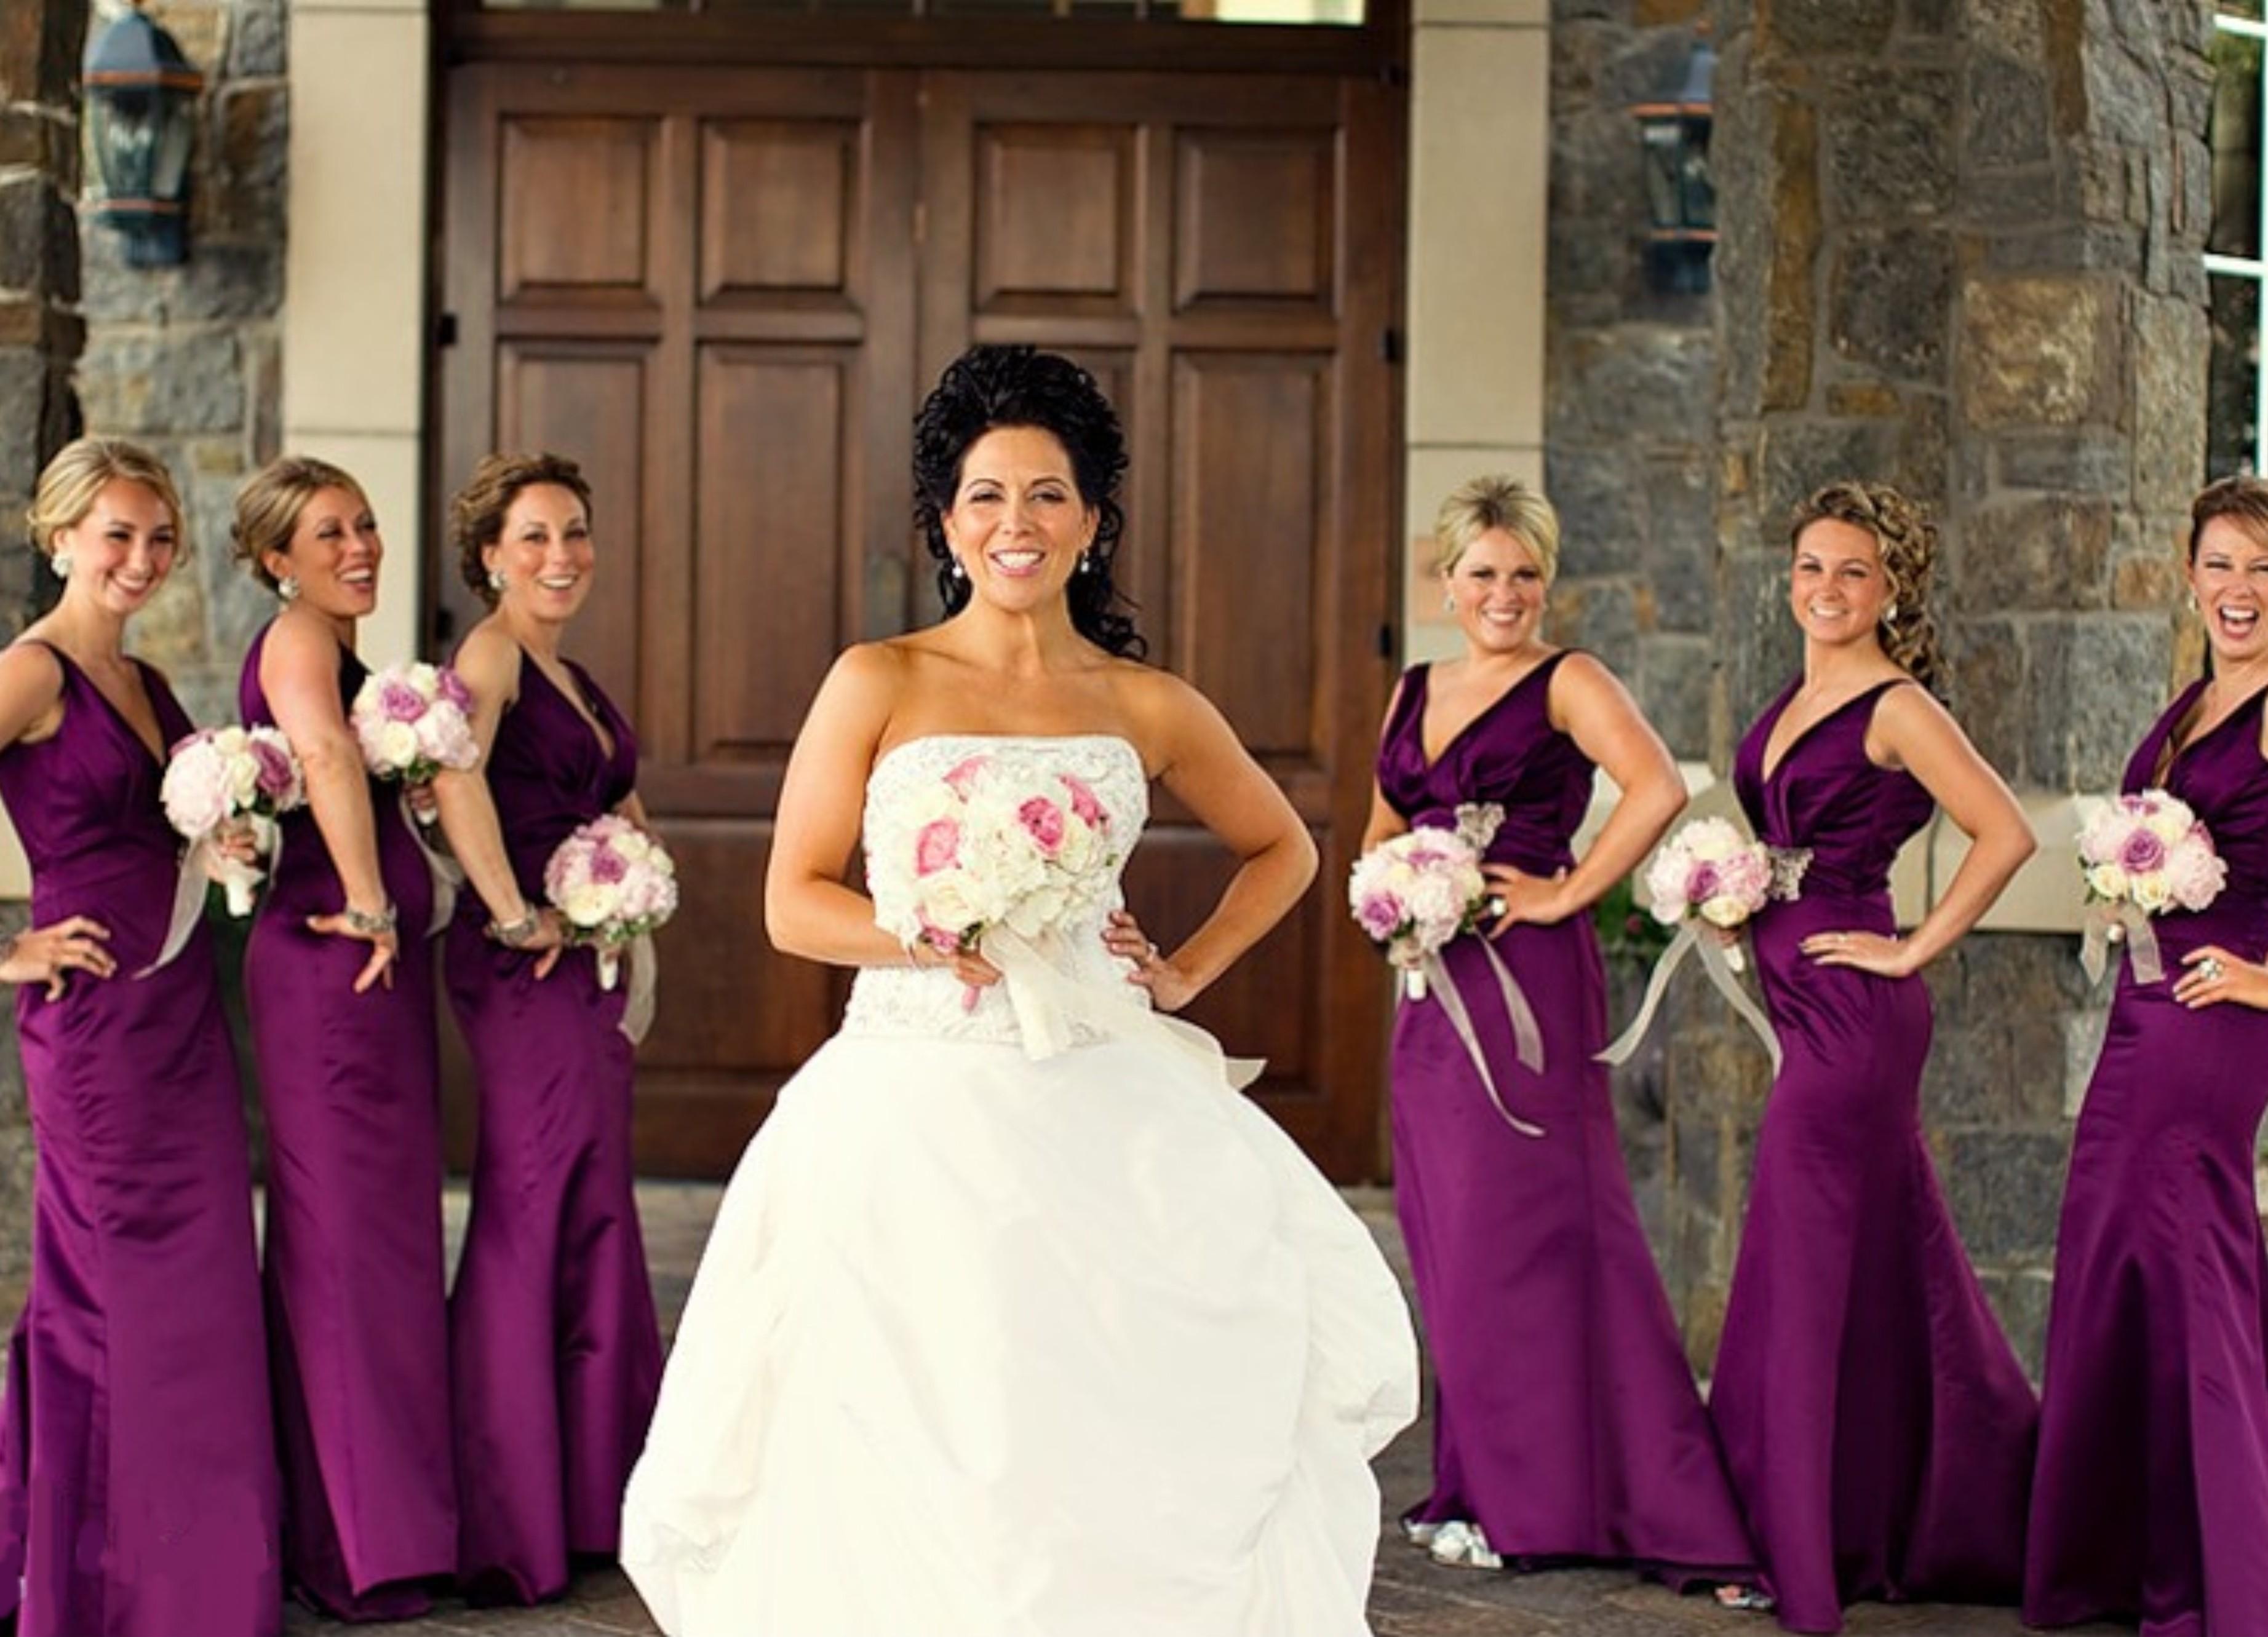 запросу наряд на свадьбу картинки тем менее